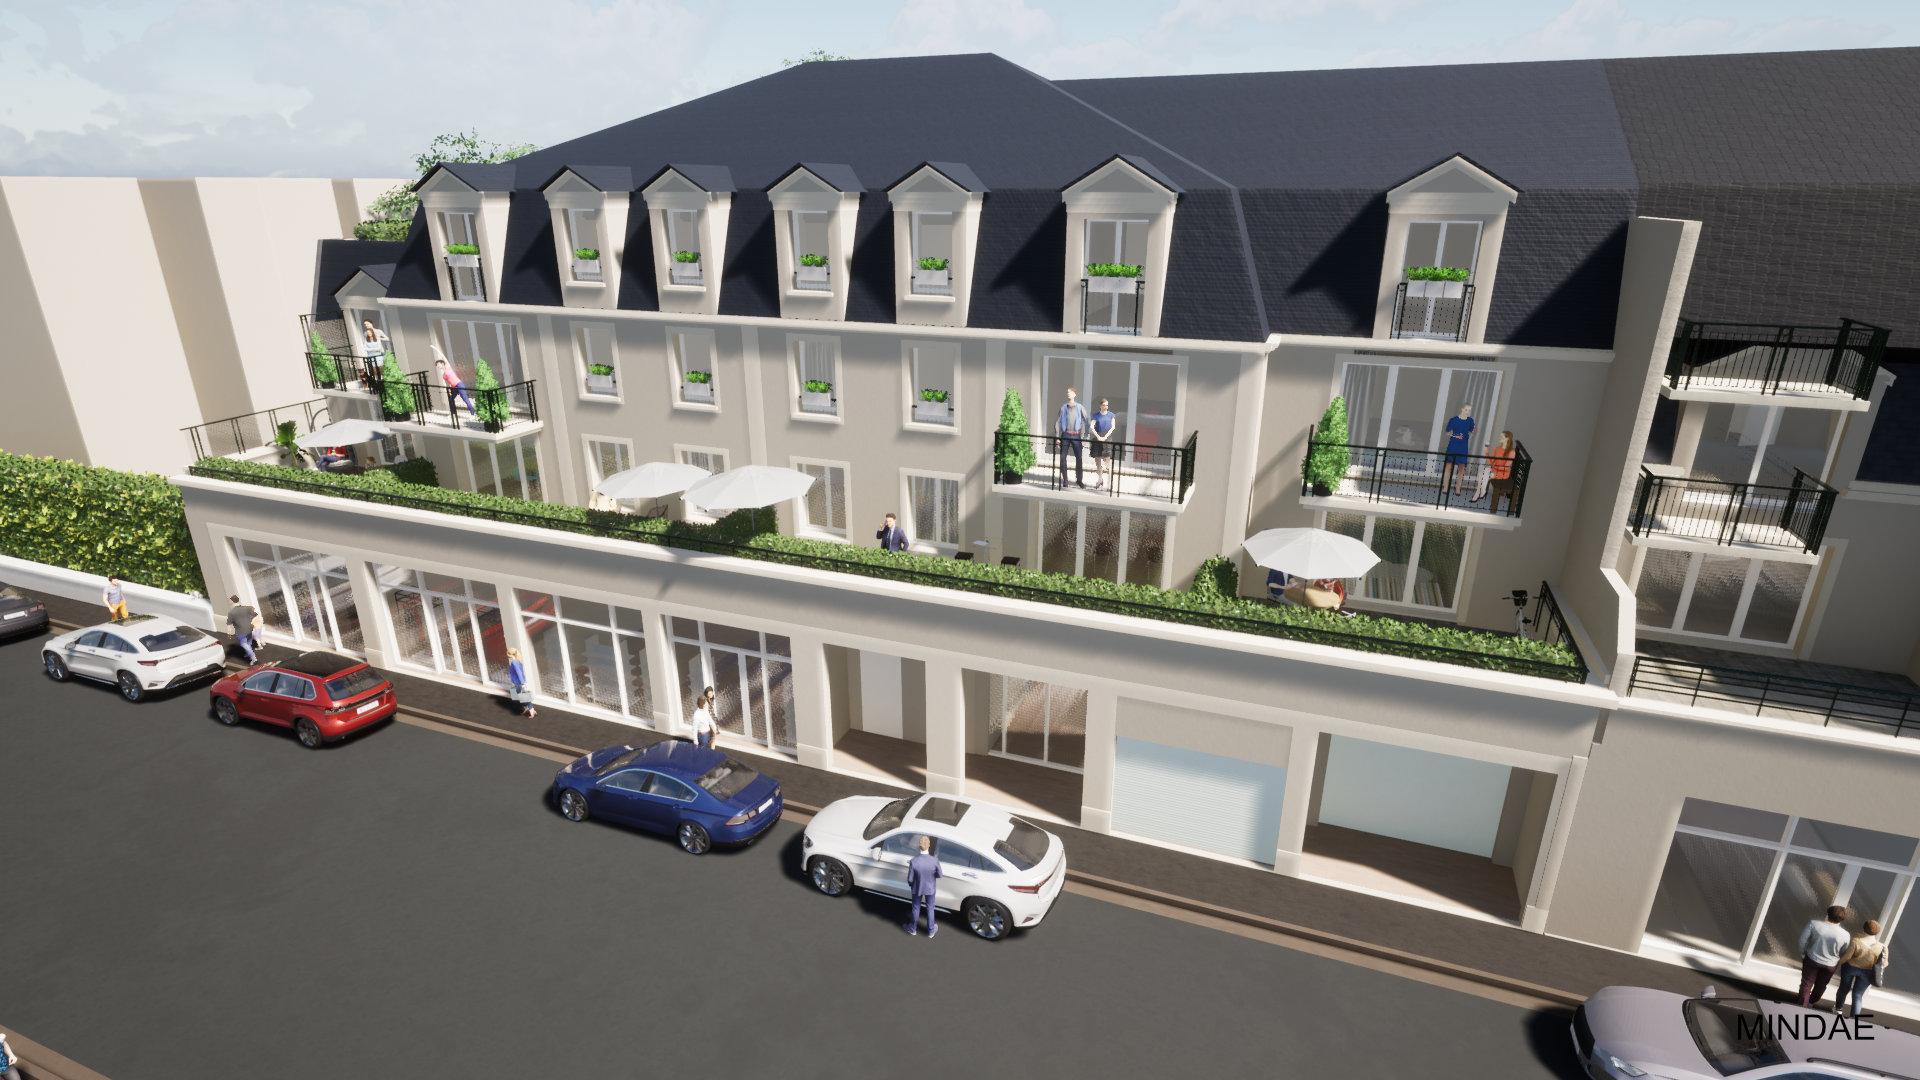 Mindae_3D_klik_studio_cabourg_bavent_immobilier_immeuble_perspective_promotion_modelisation_promoteur-(3)